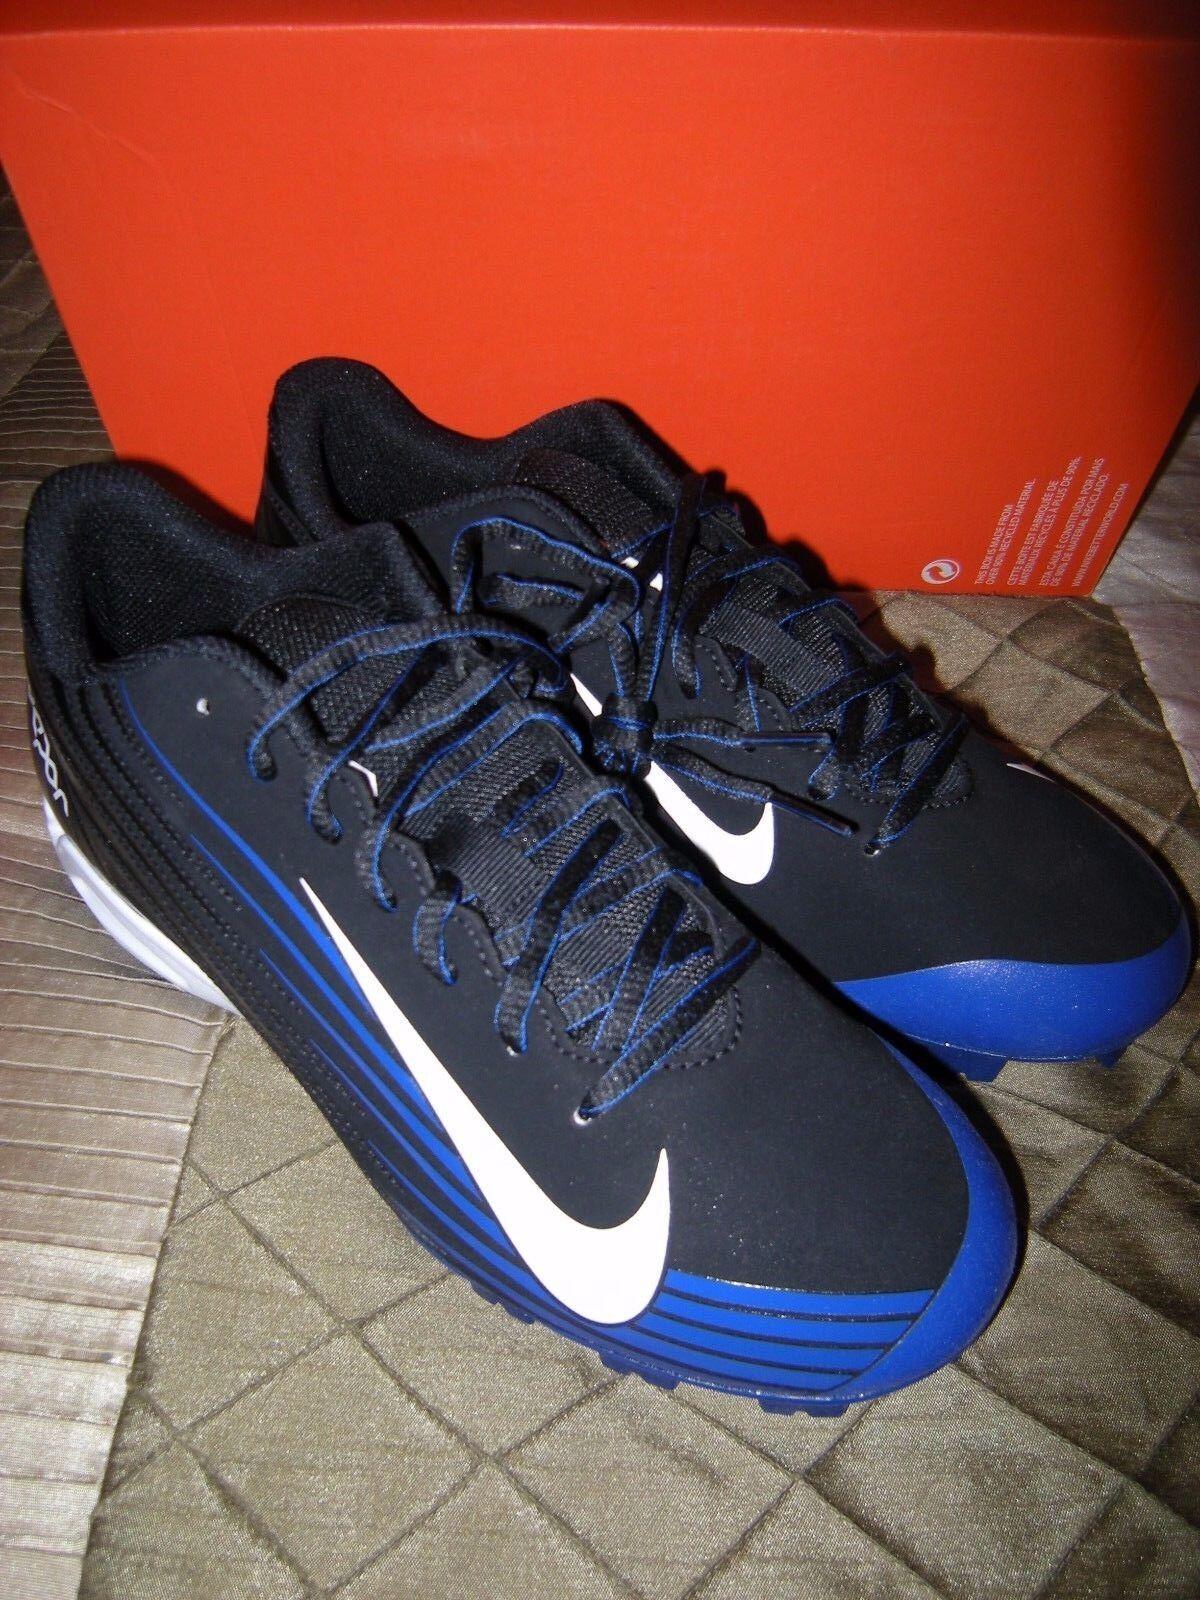 Brand New Mens Black & Blue Nike Vapor Strike 2 Baseball Cleats, Comfortable Casual wild